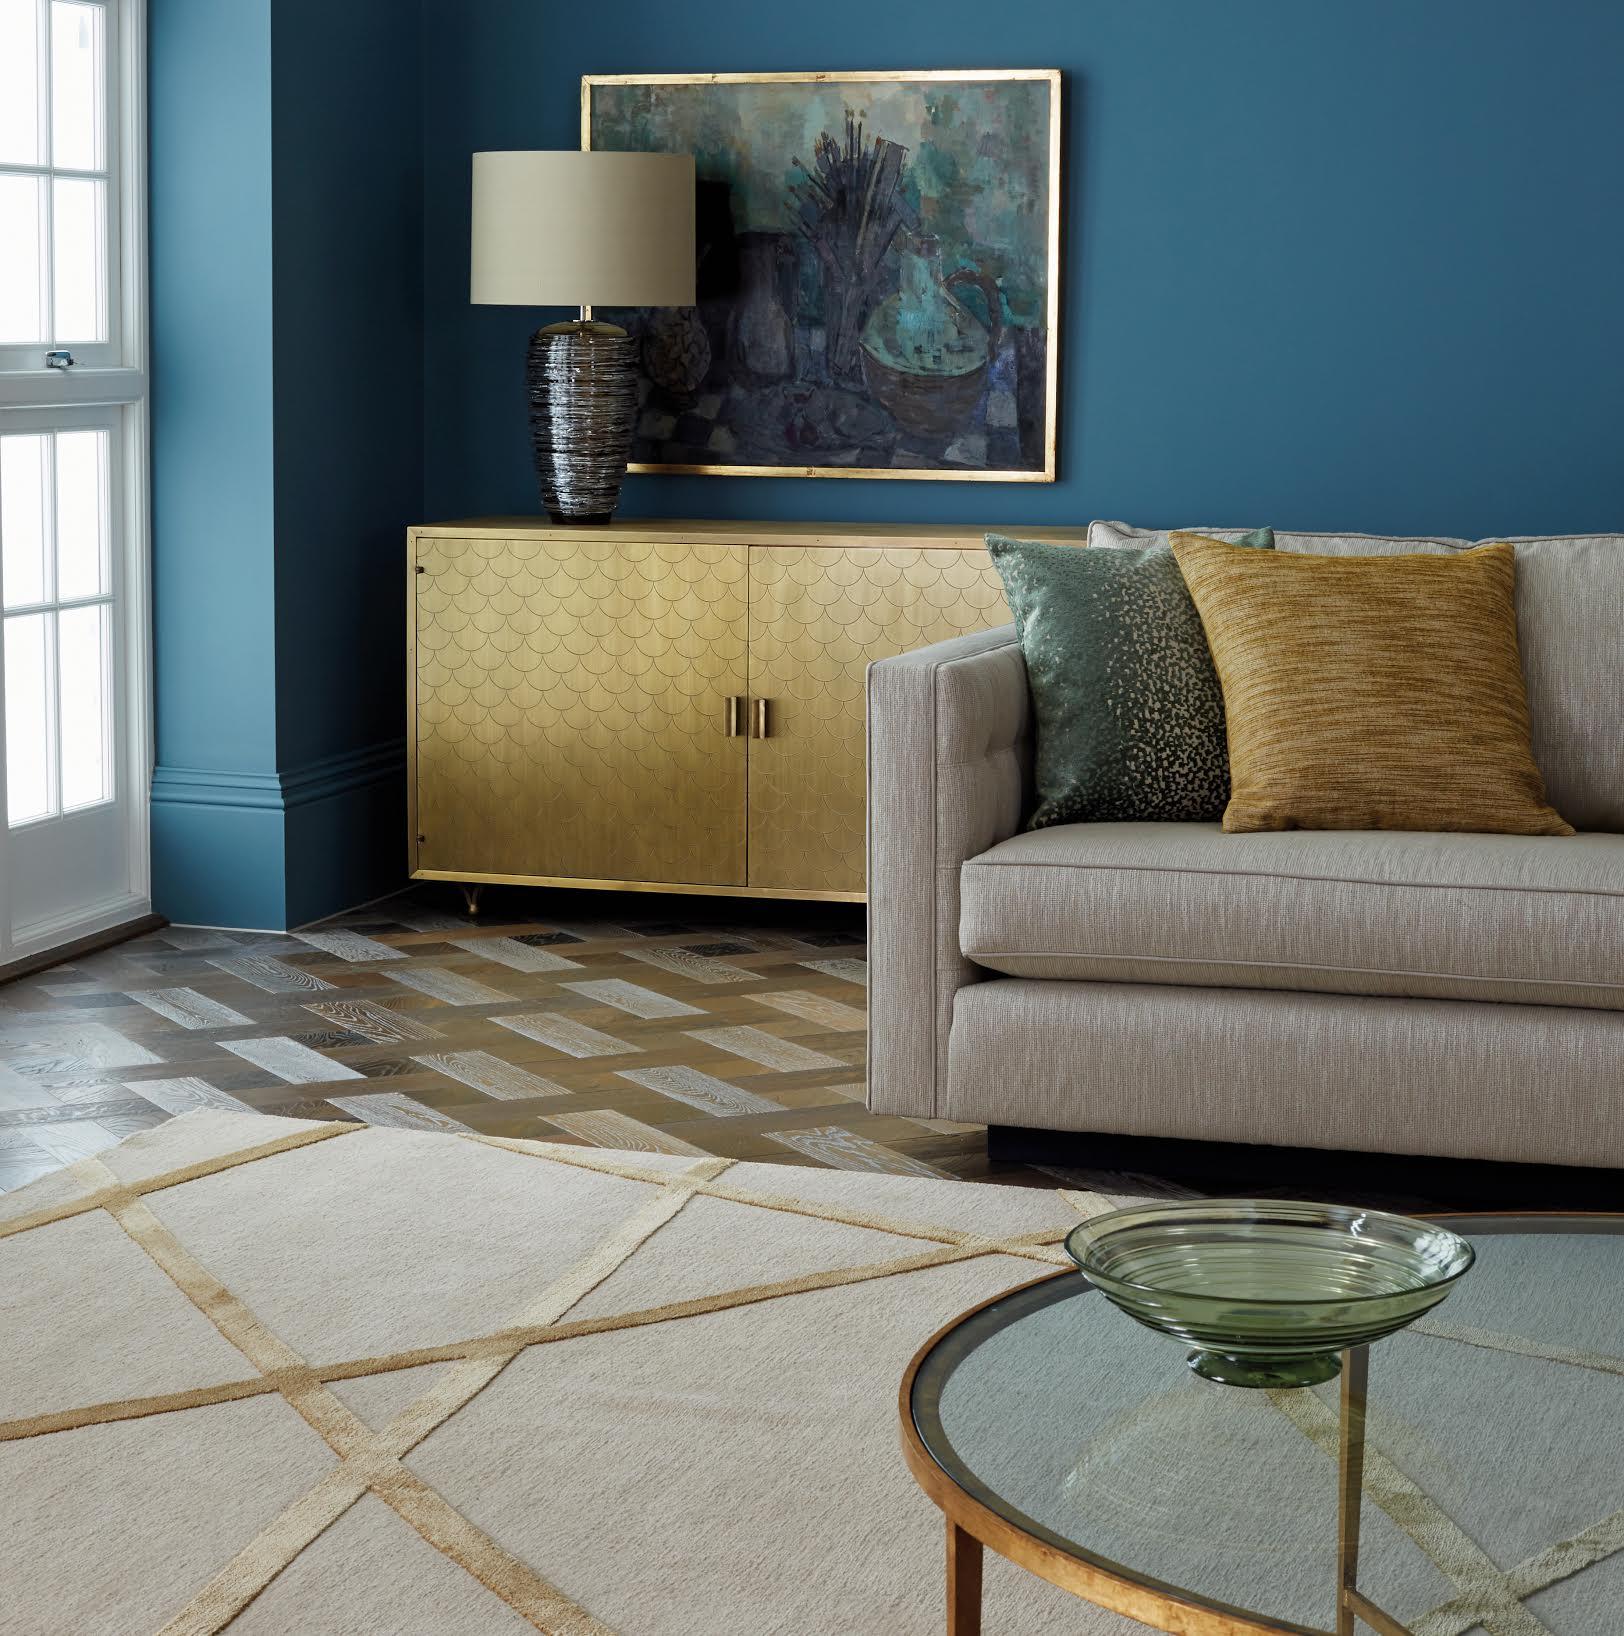 Interiors Advent Calendar - Riviere Rugs Aix collection @ Masha Shapiro Agency.jpg